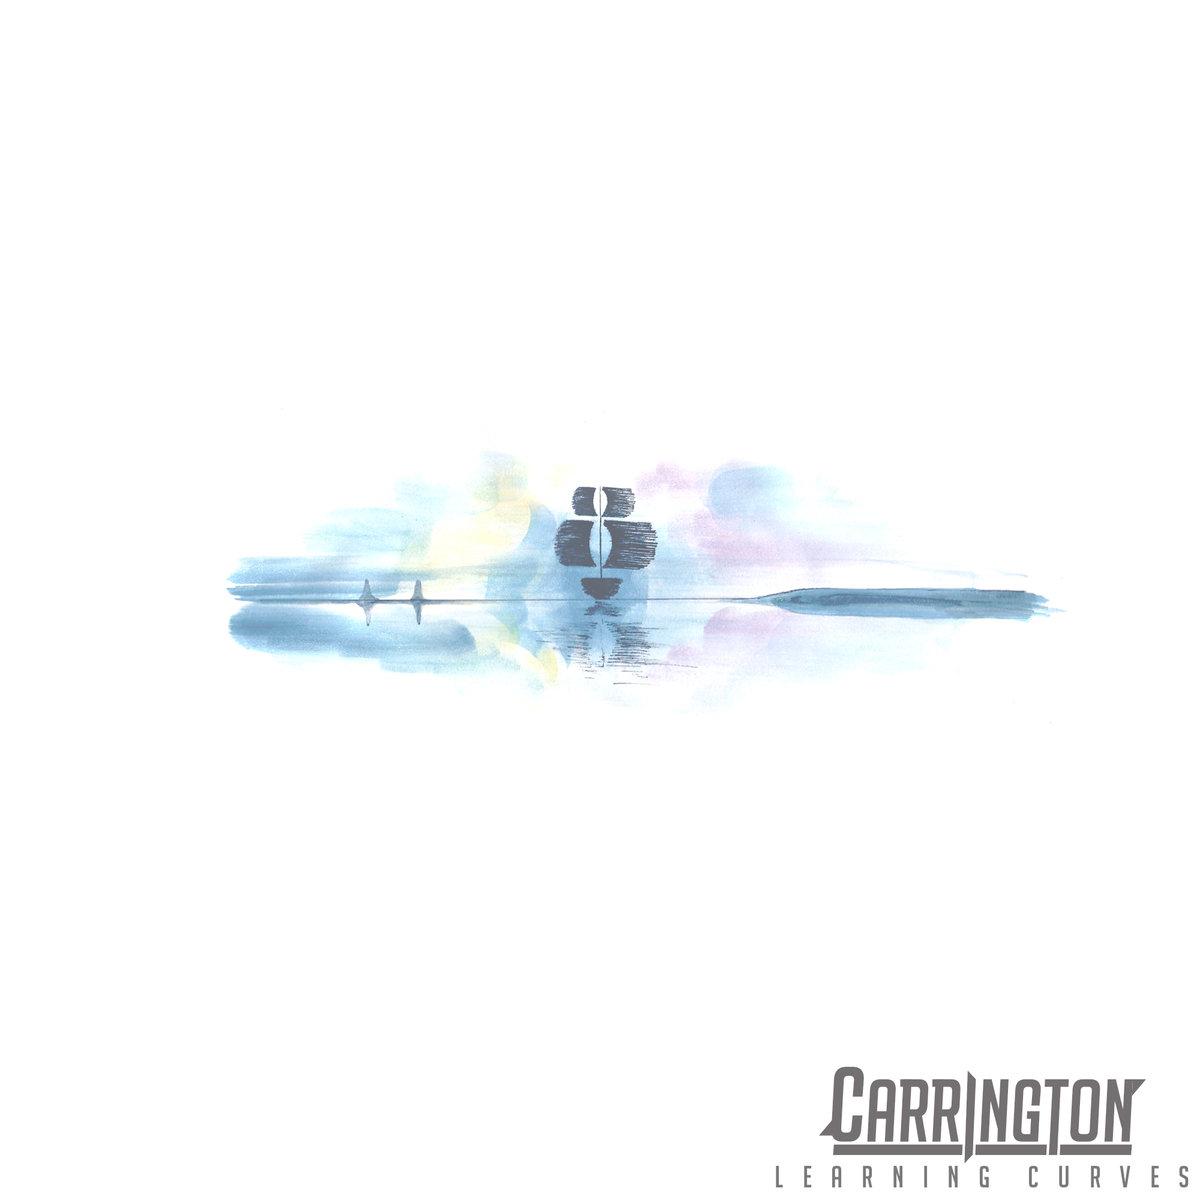 Carrington - Leaving Curves